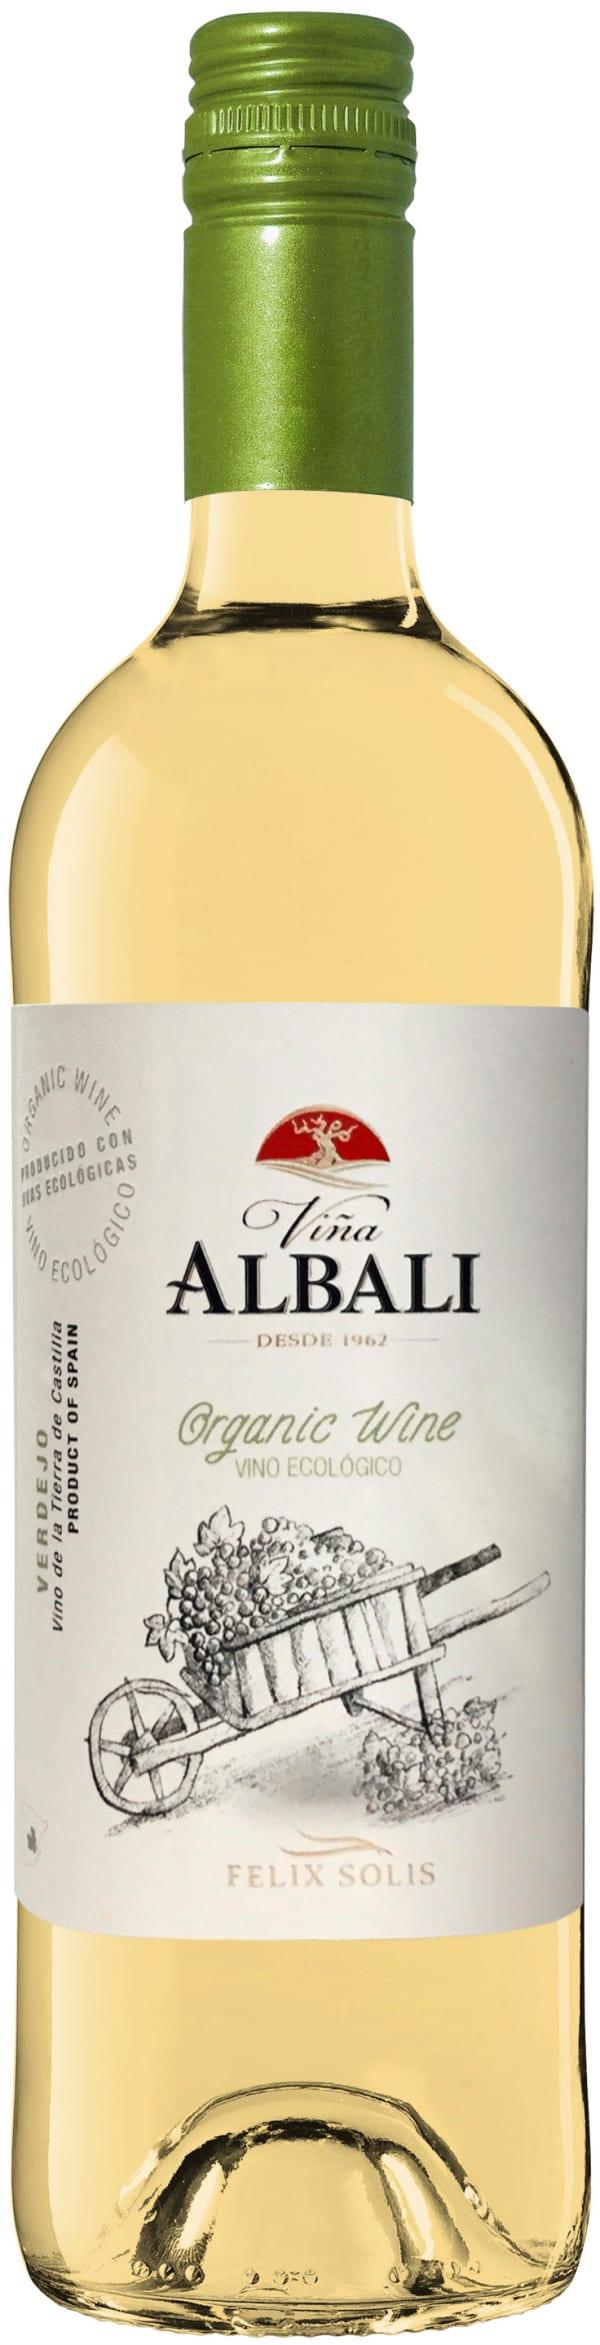 Viña Albali Verdejo Organic 2017